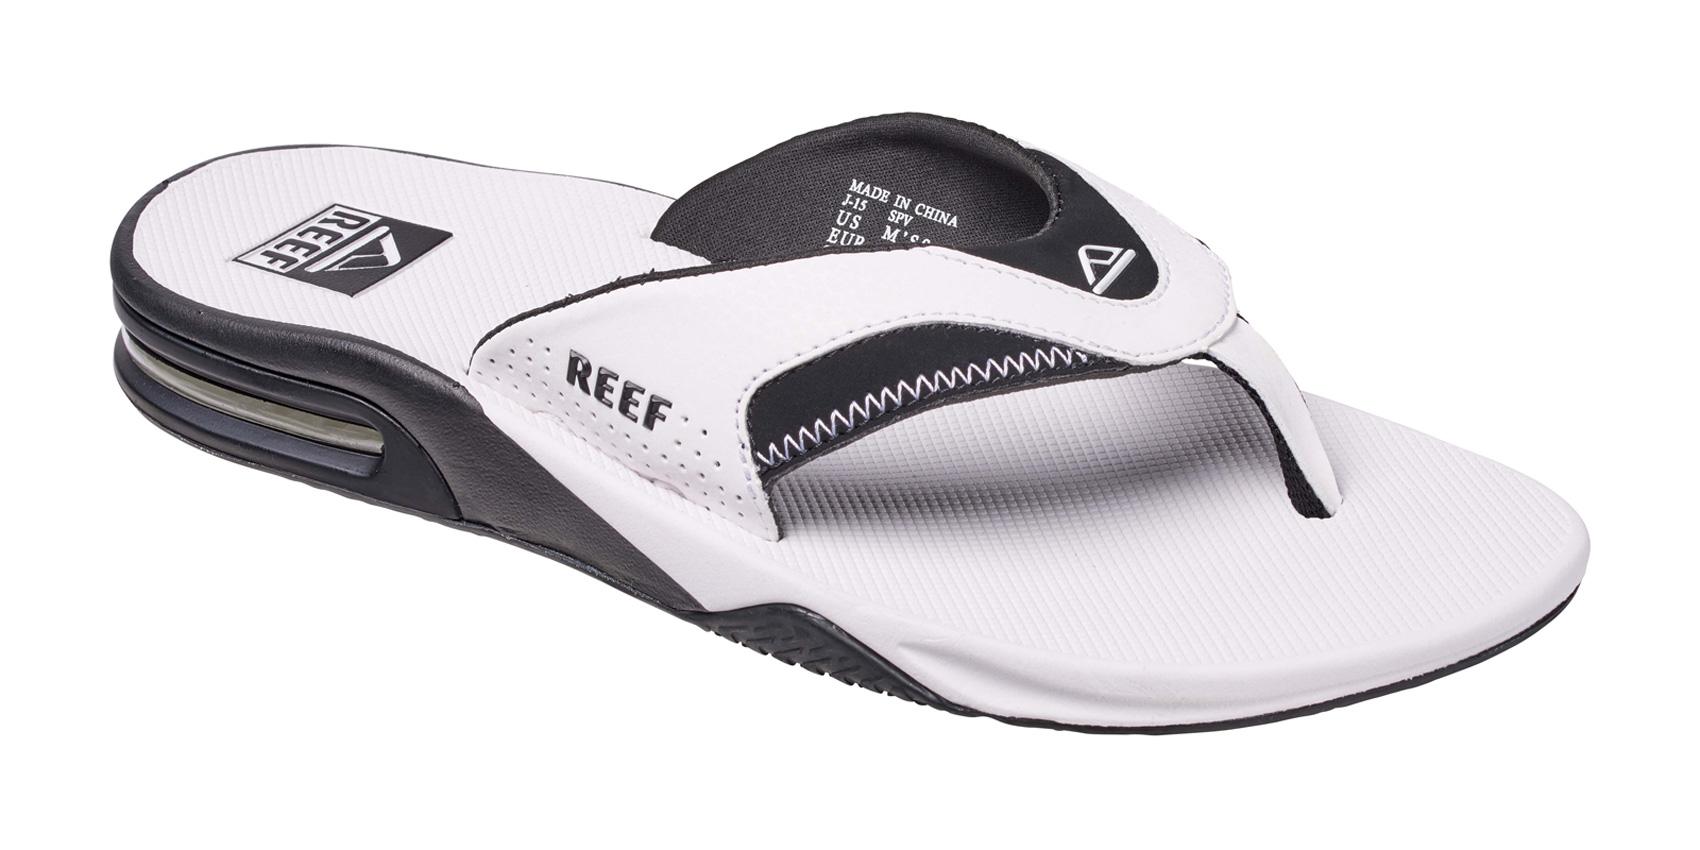 Black reef sandals - Reef Sandal Fanning Flip Flops Mick Cushioned Bottle